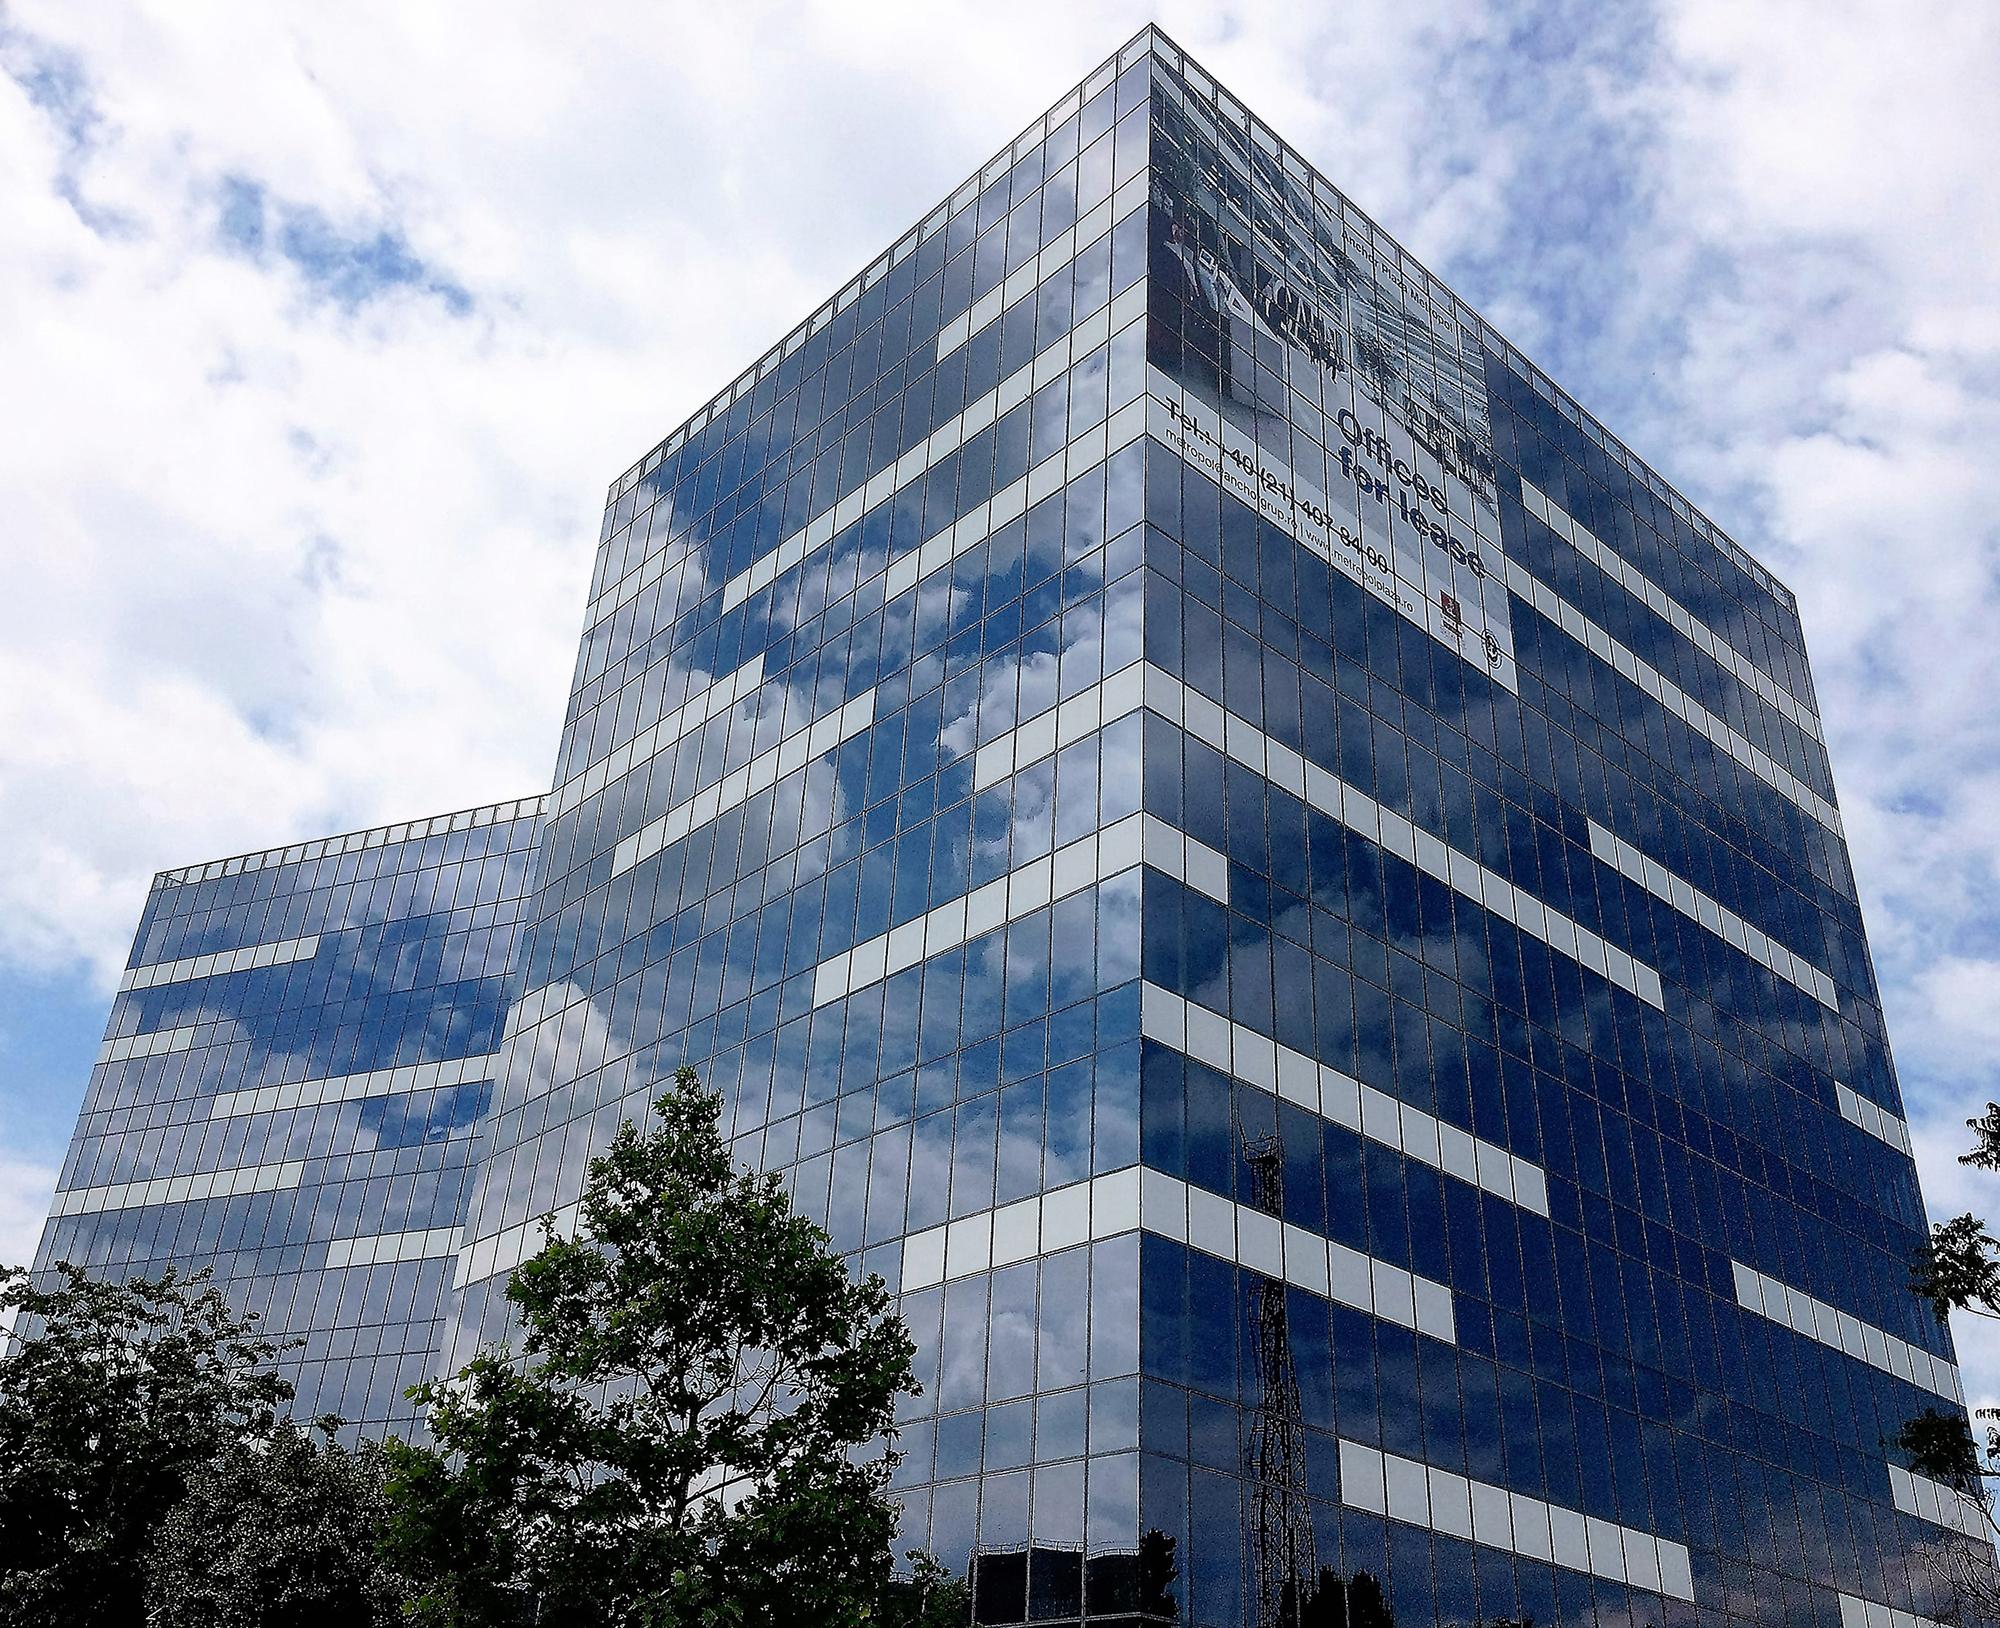 Anvelopa exterioara sticla Business Center - Anchor Plaza Metropol - Anvelopa exterioara din sticla, Business Center - Anchor Plaza Metropol